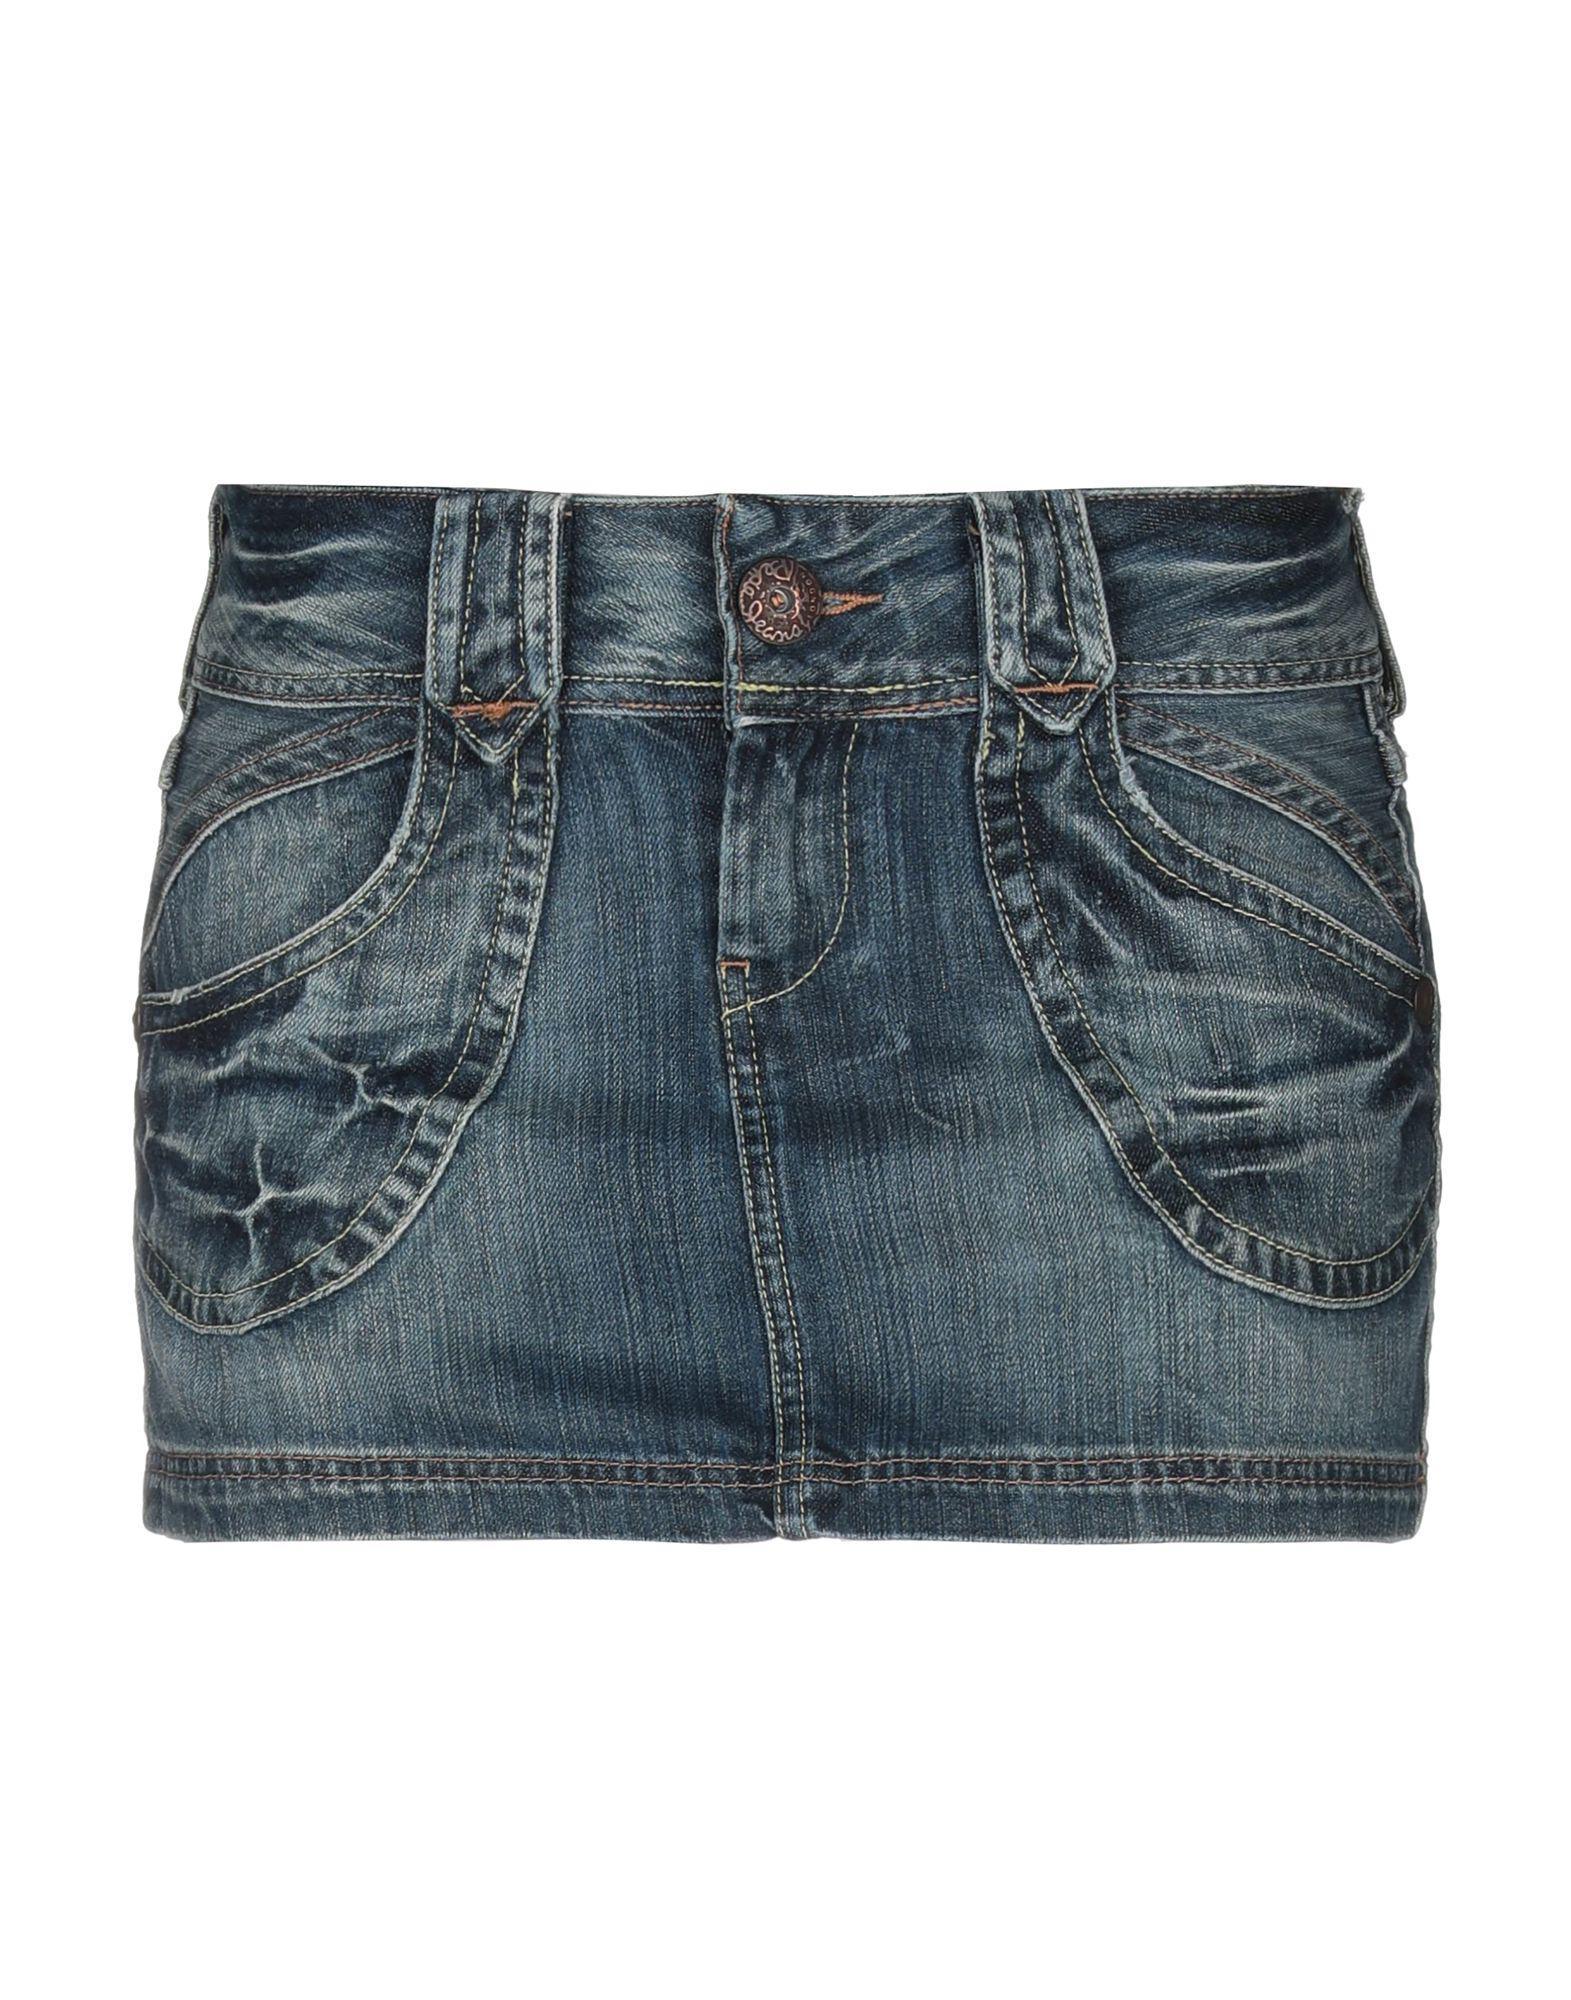 6fe9b66487 Pepe Jeans Denim Skirts in Blue - Lyst